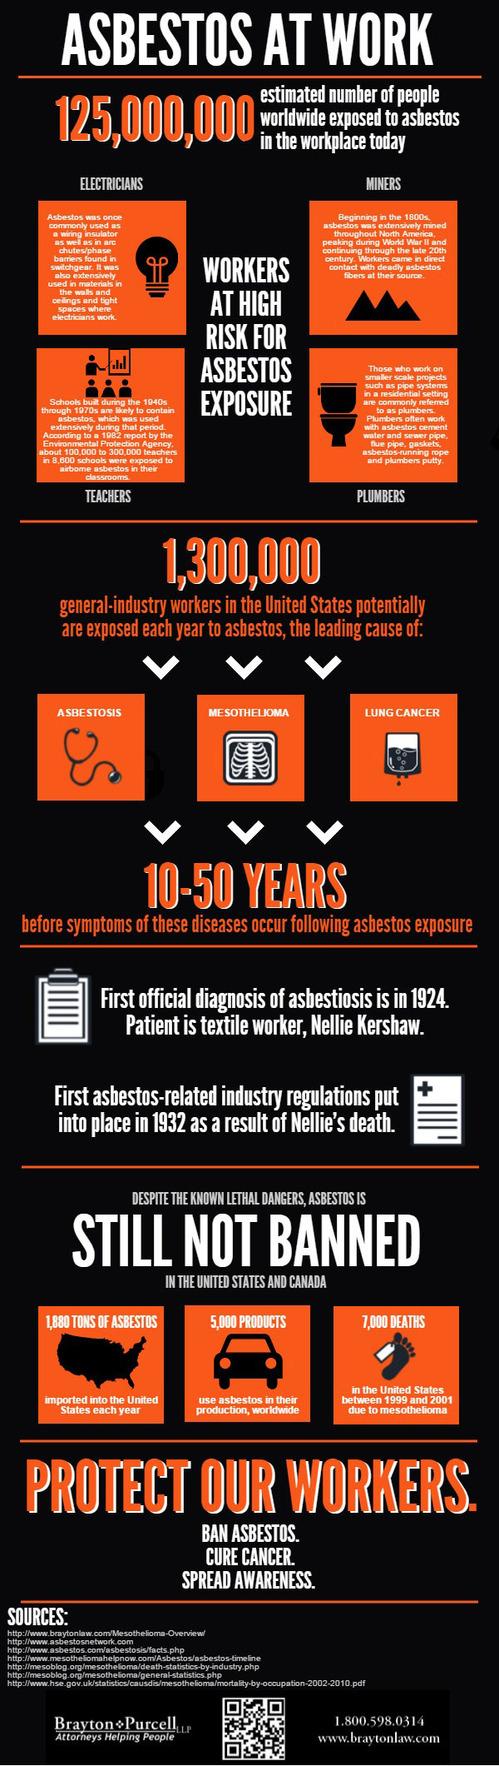 48++ Asbestos year banned